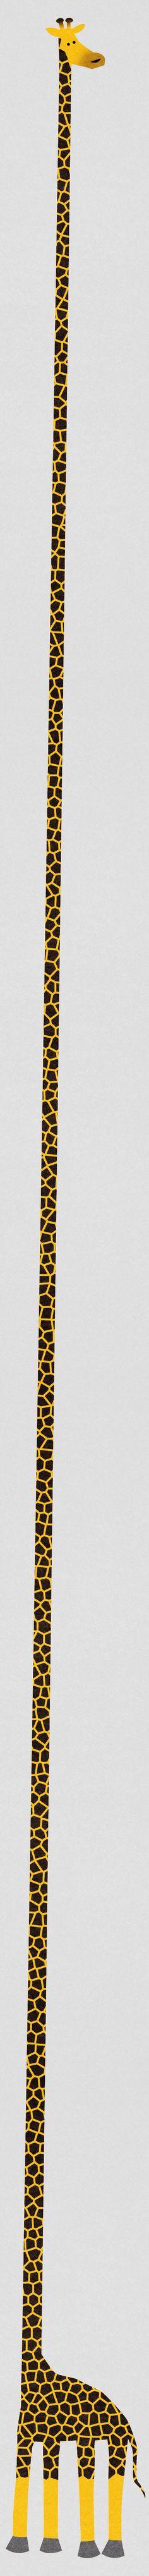 Maravillosa forma de poner a una jirafa...jaja